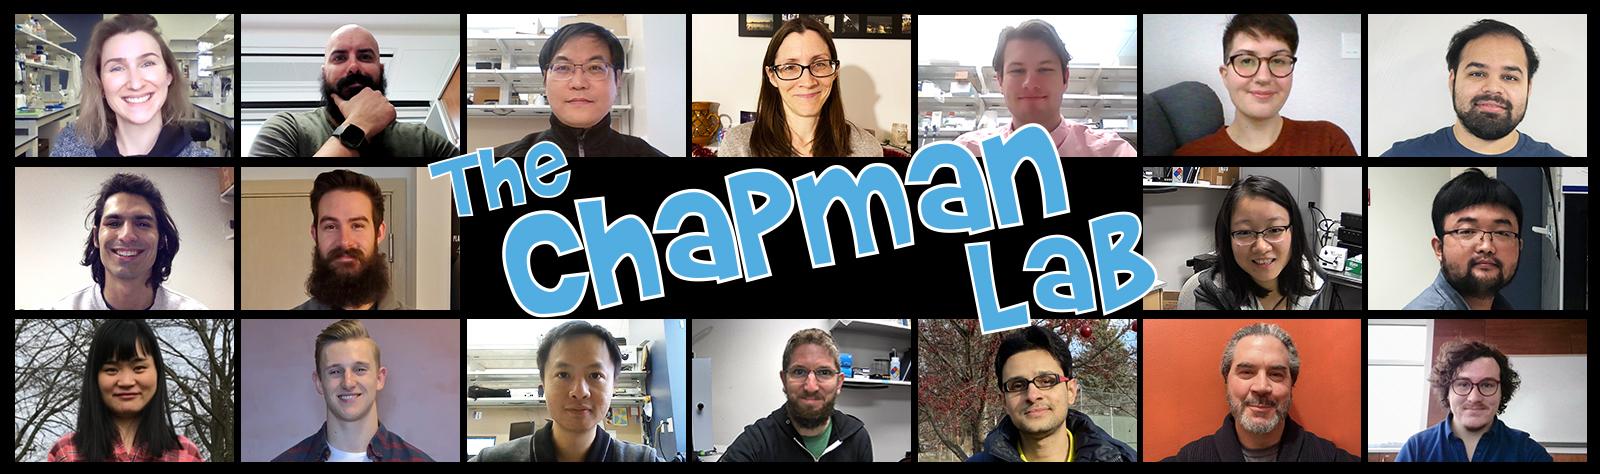 Chapman Lab Group Photo